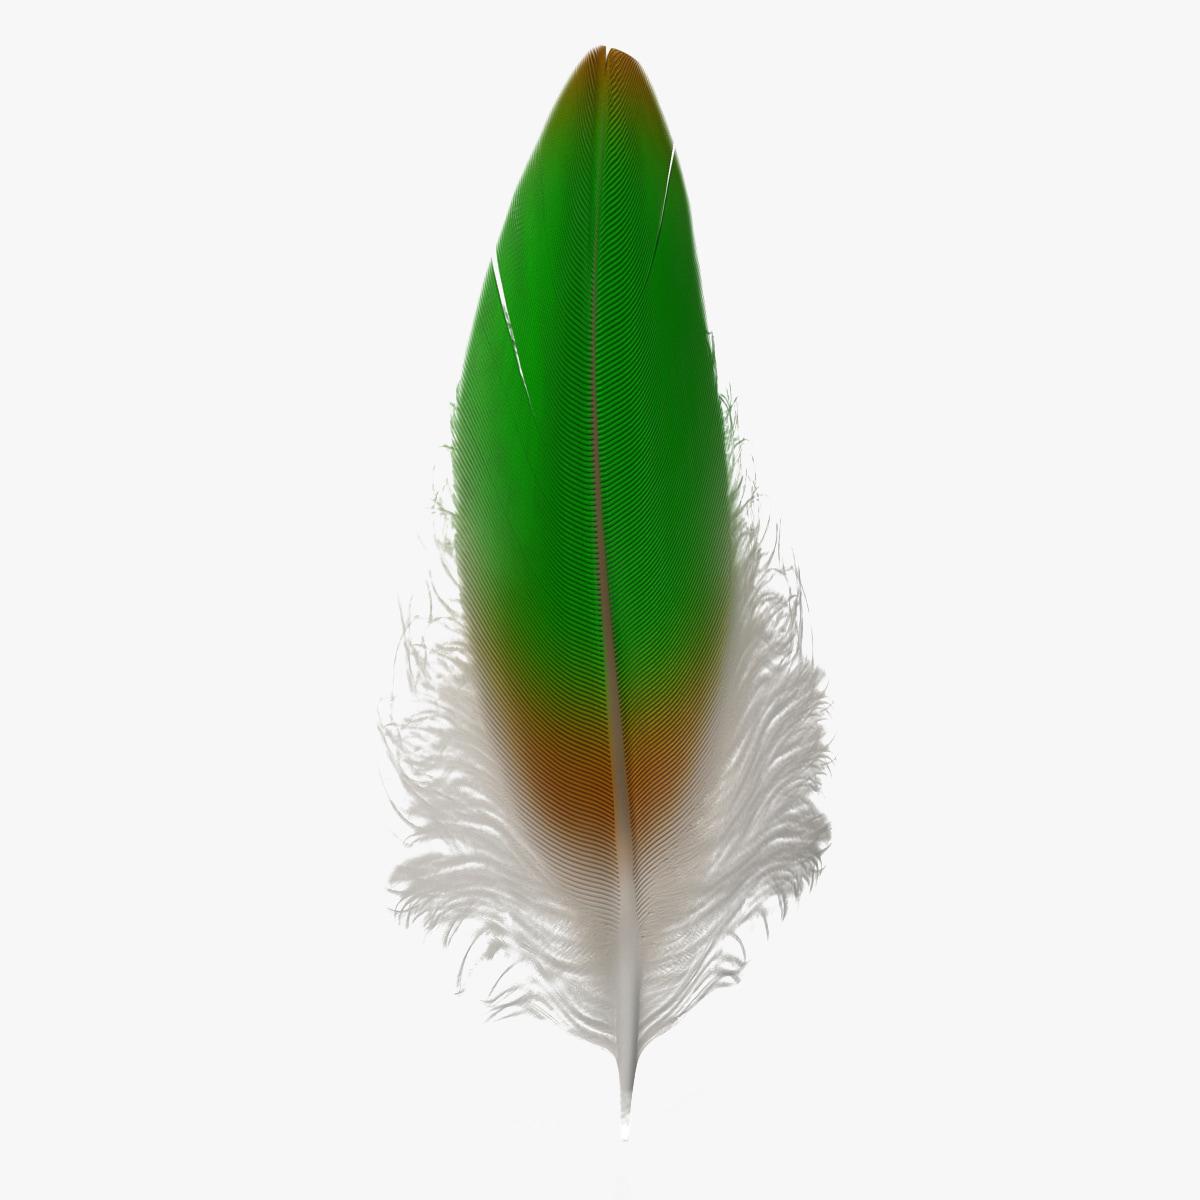 Feather_95.jpg